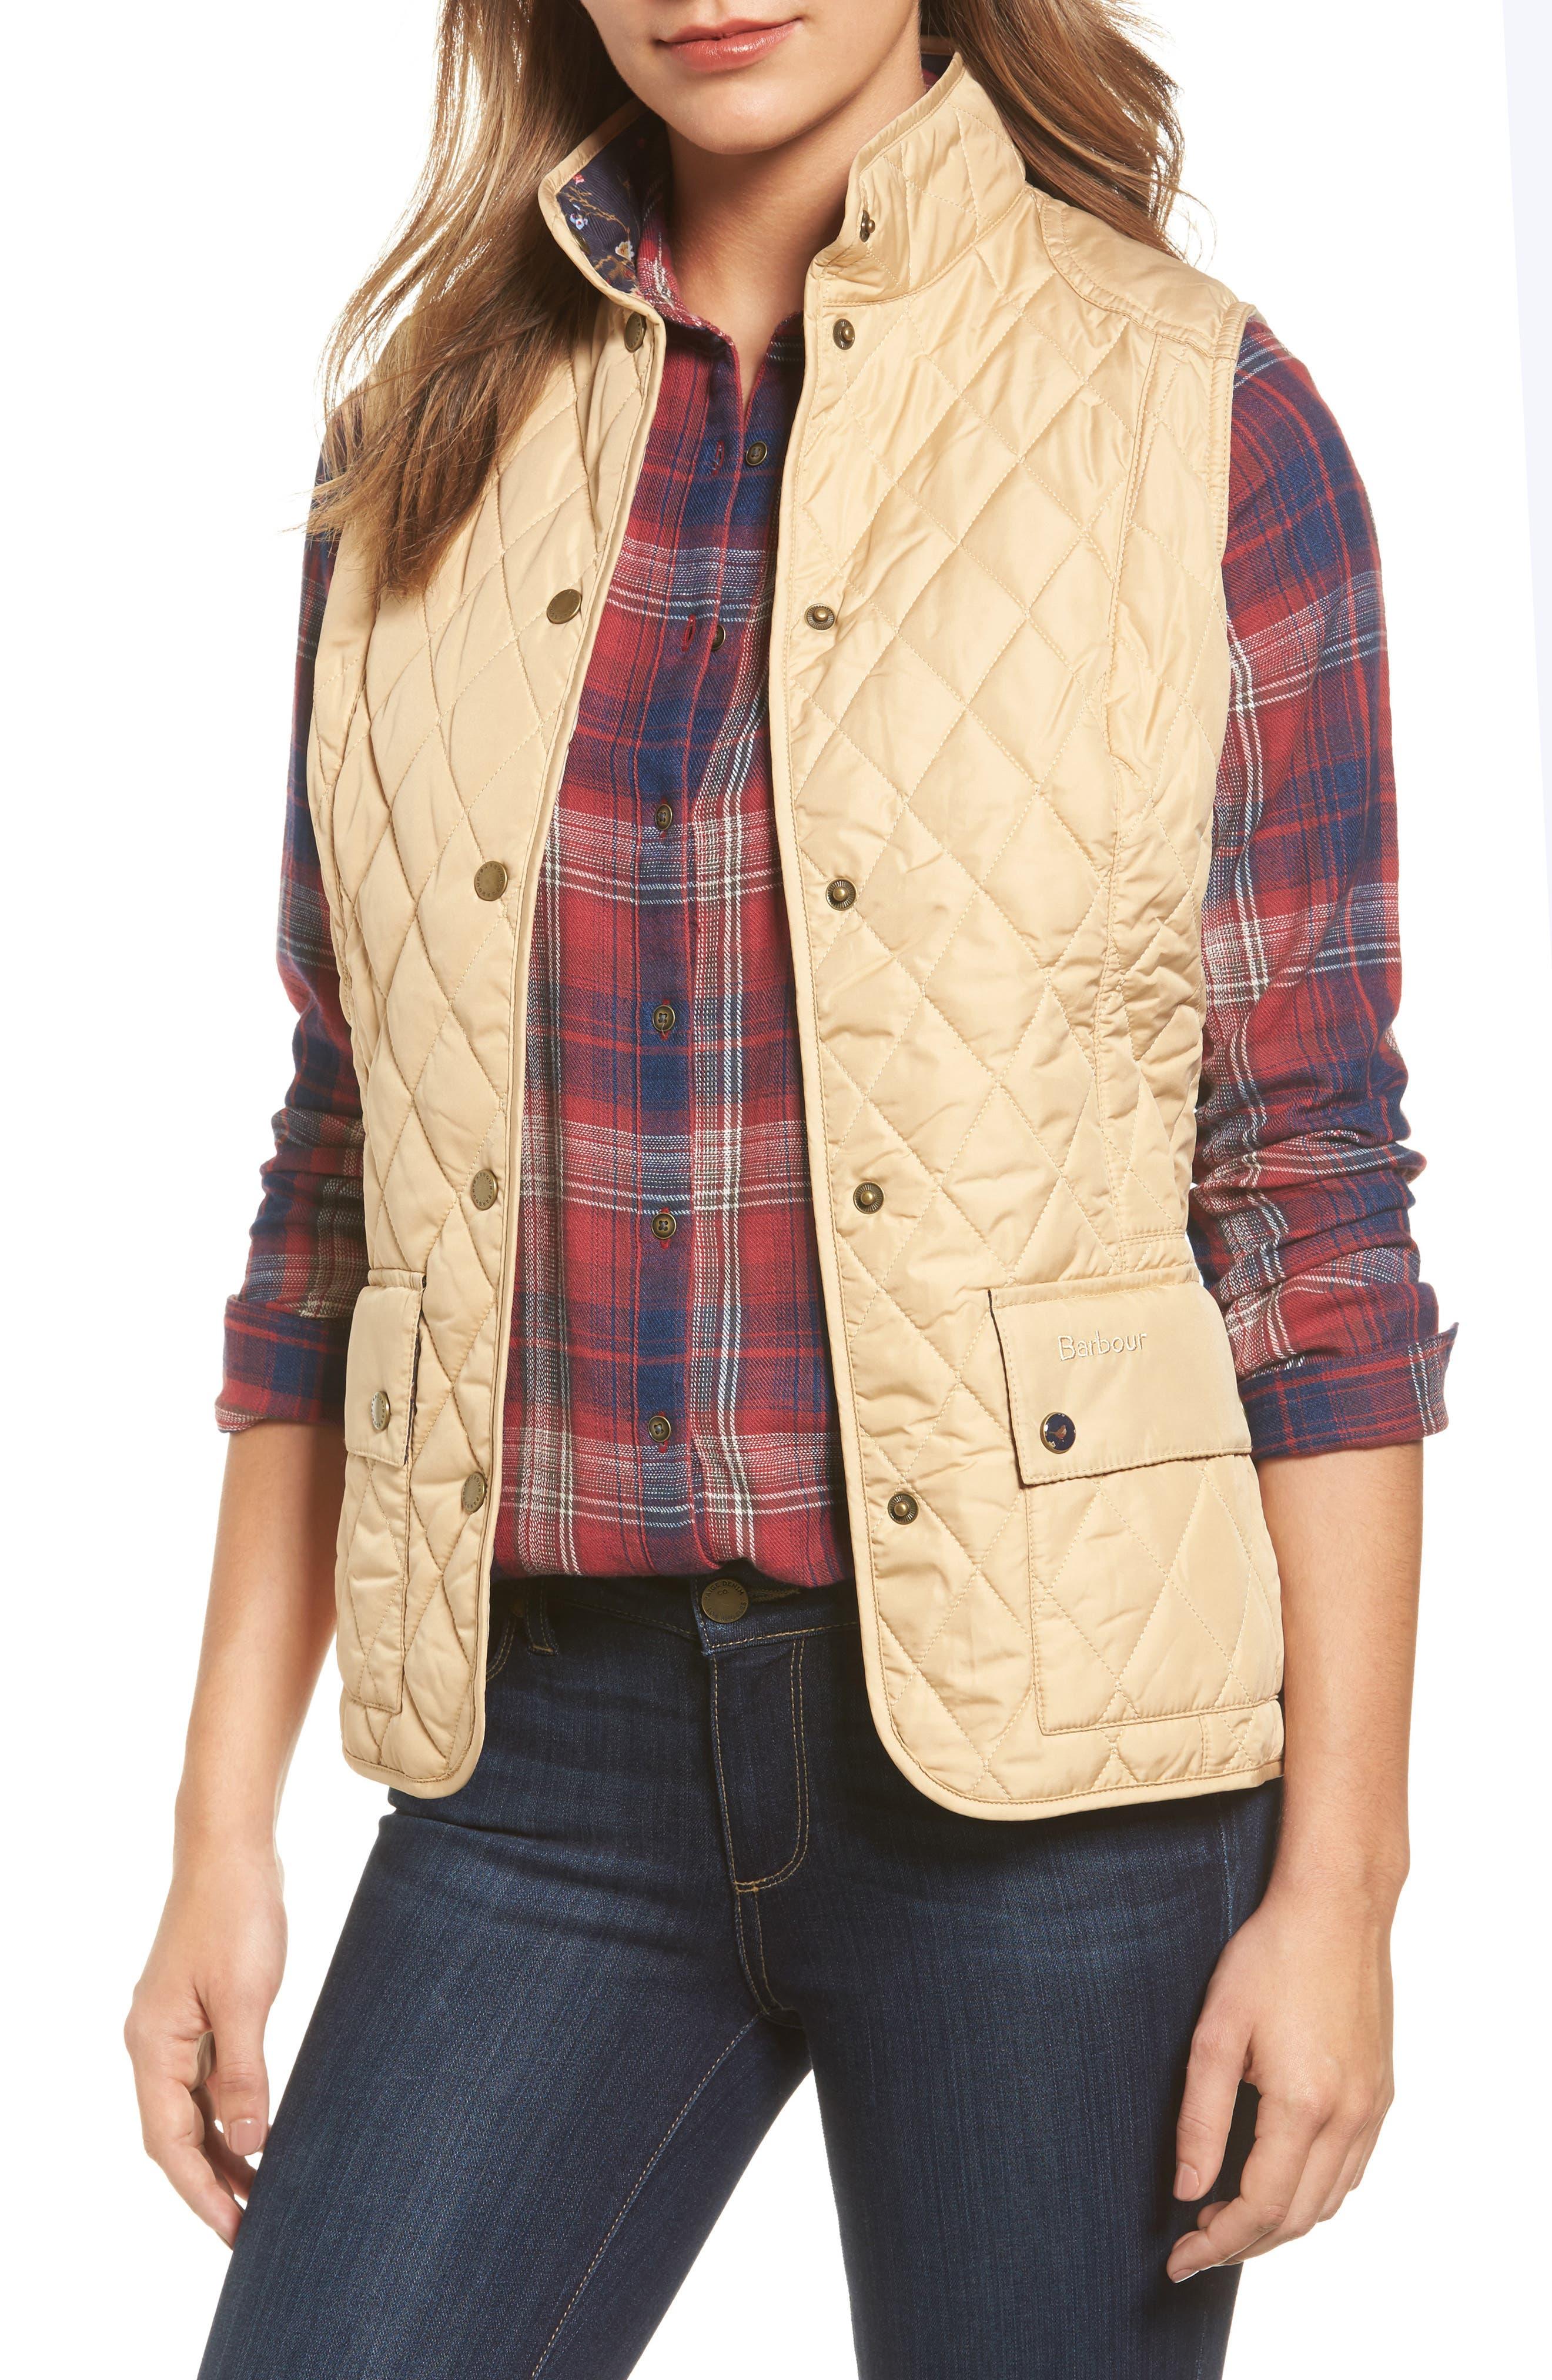 Alternate Image 1 Selected - Barbour 'Saddleworth' Quilted Vest